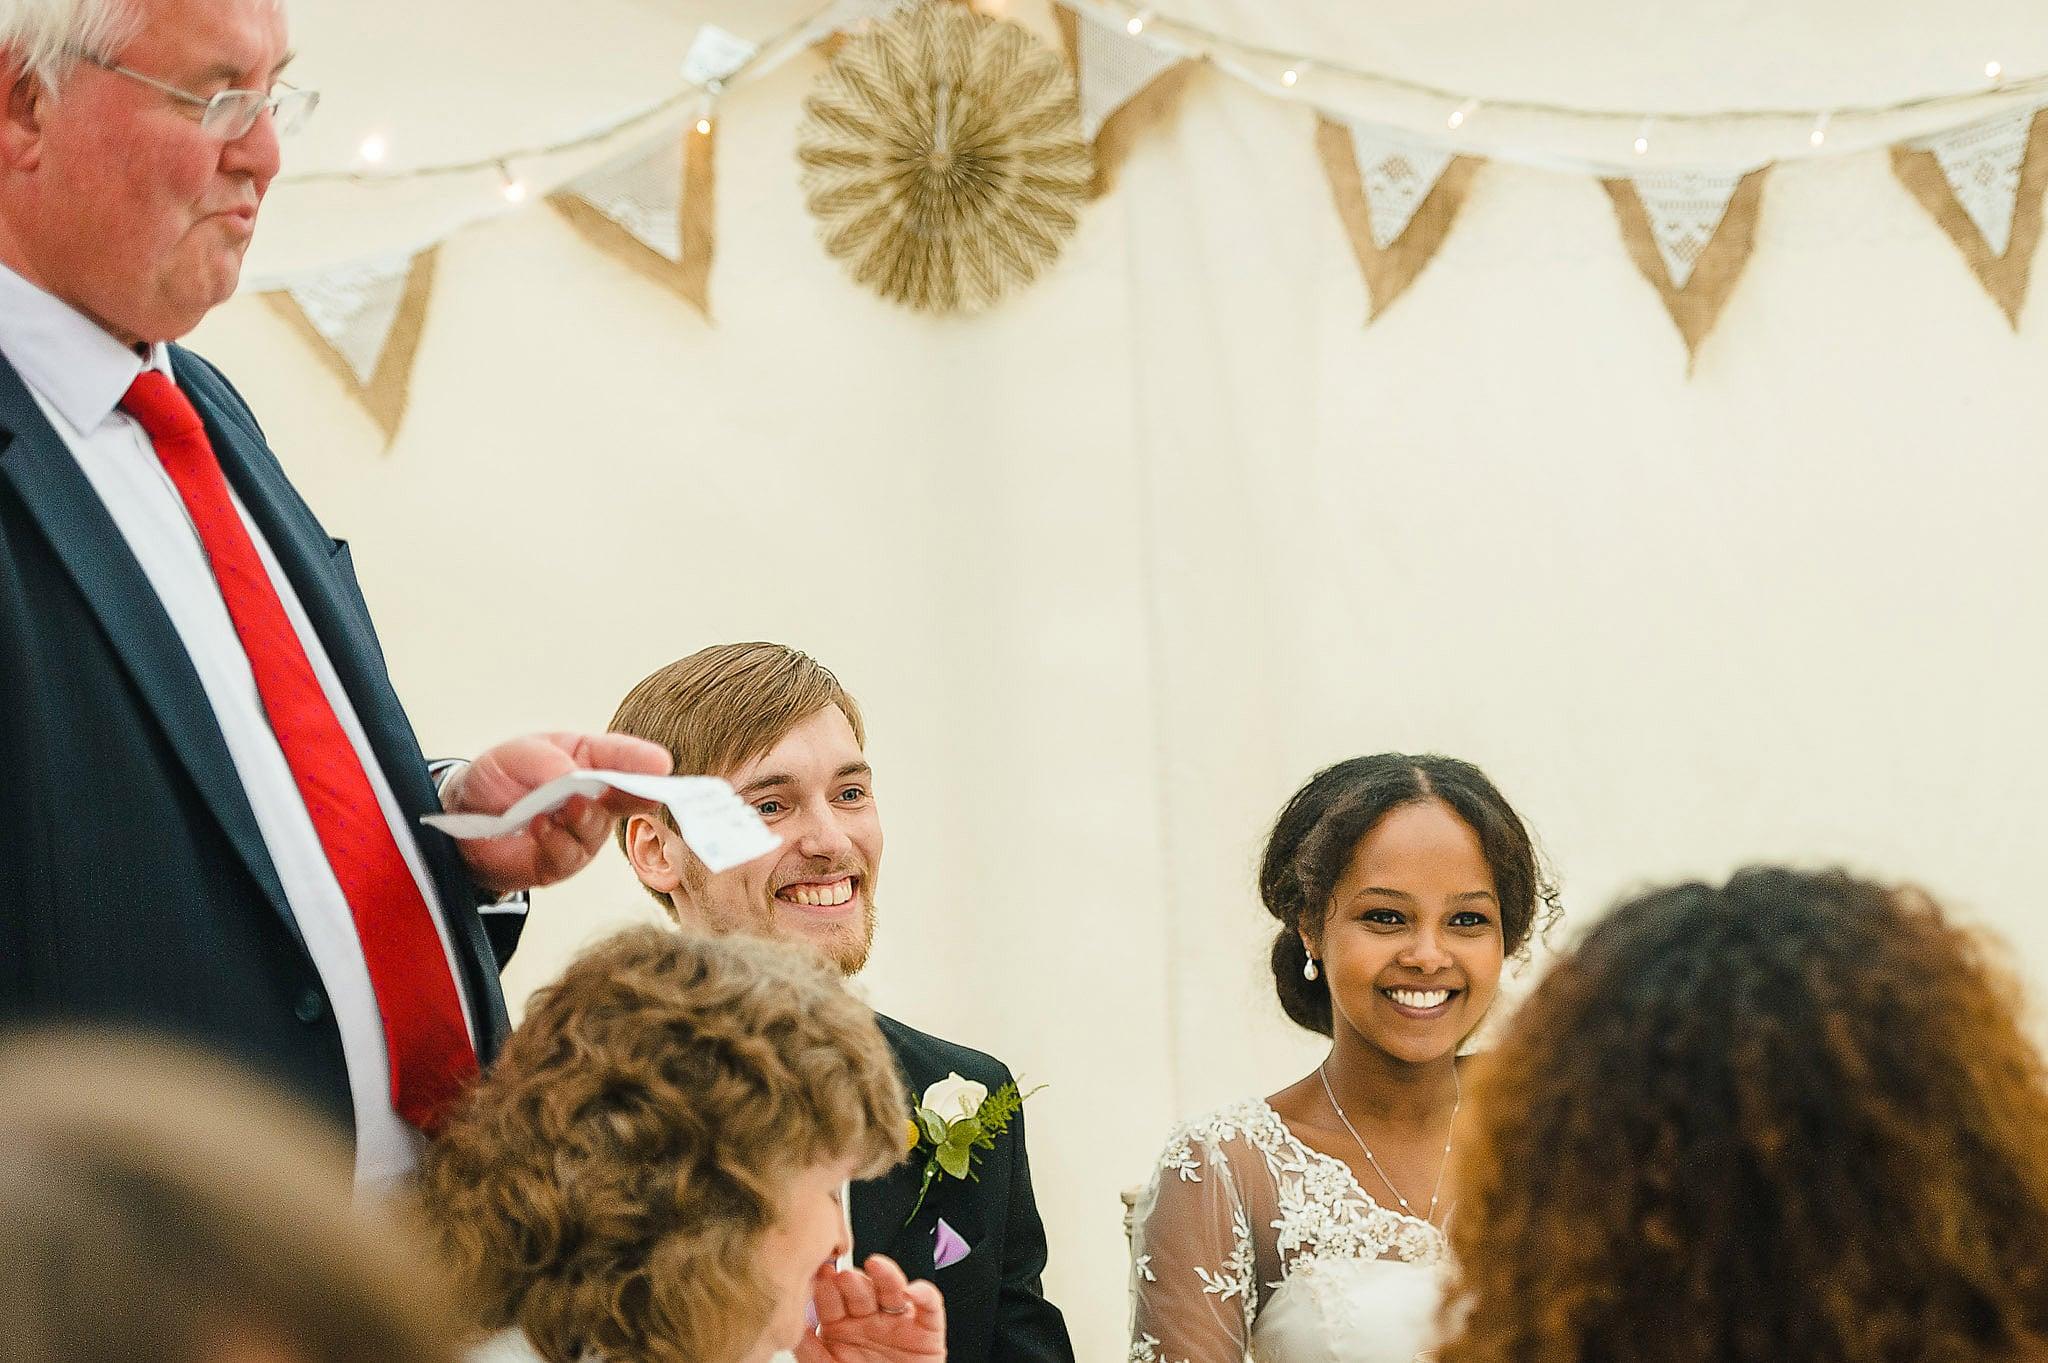 wedding-photographers-west-midlands (137)